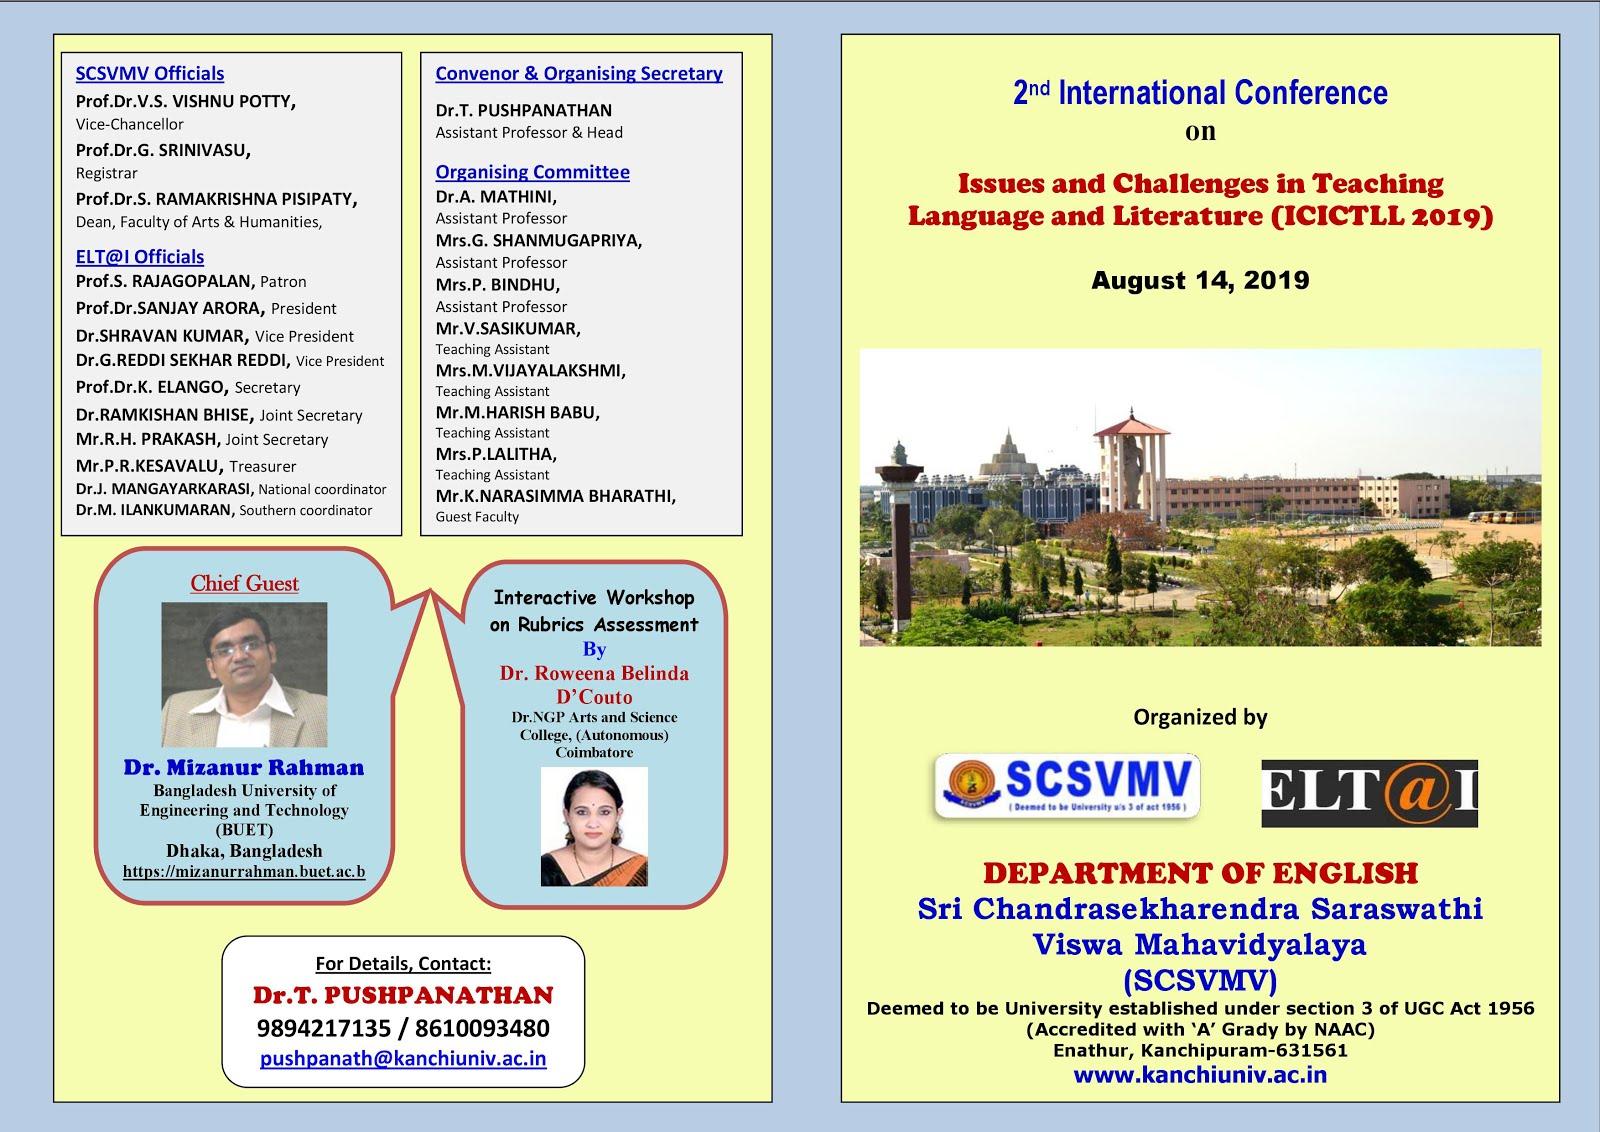 Dr KK Seminars and Conferences